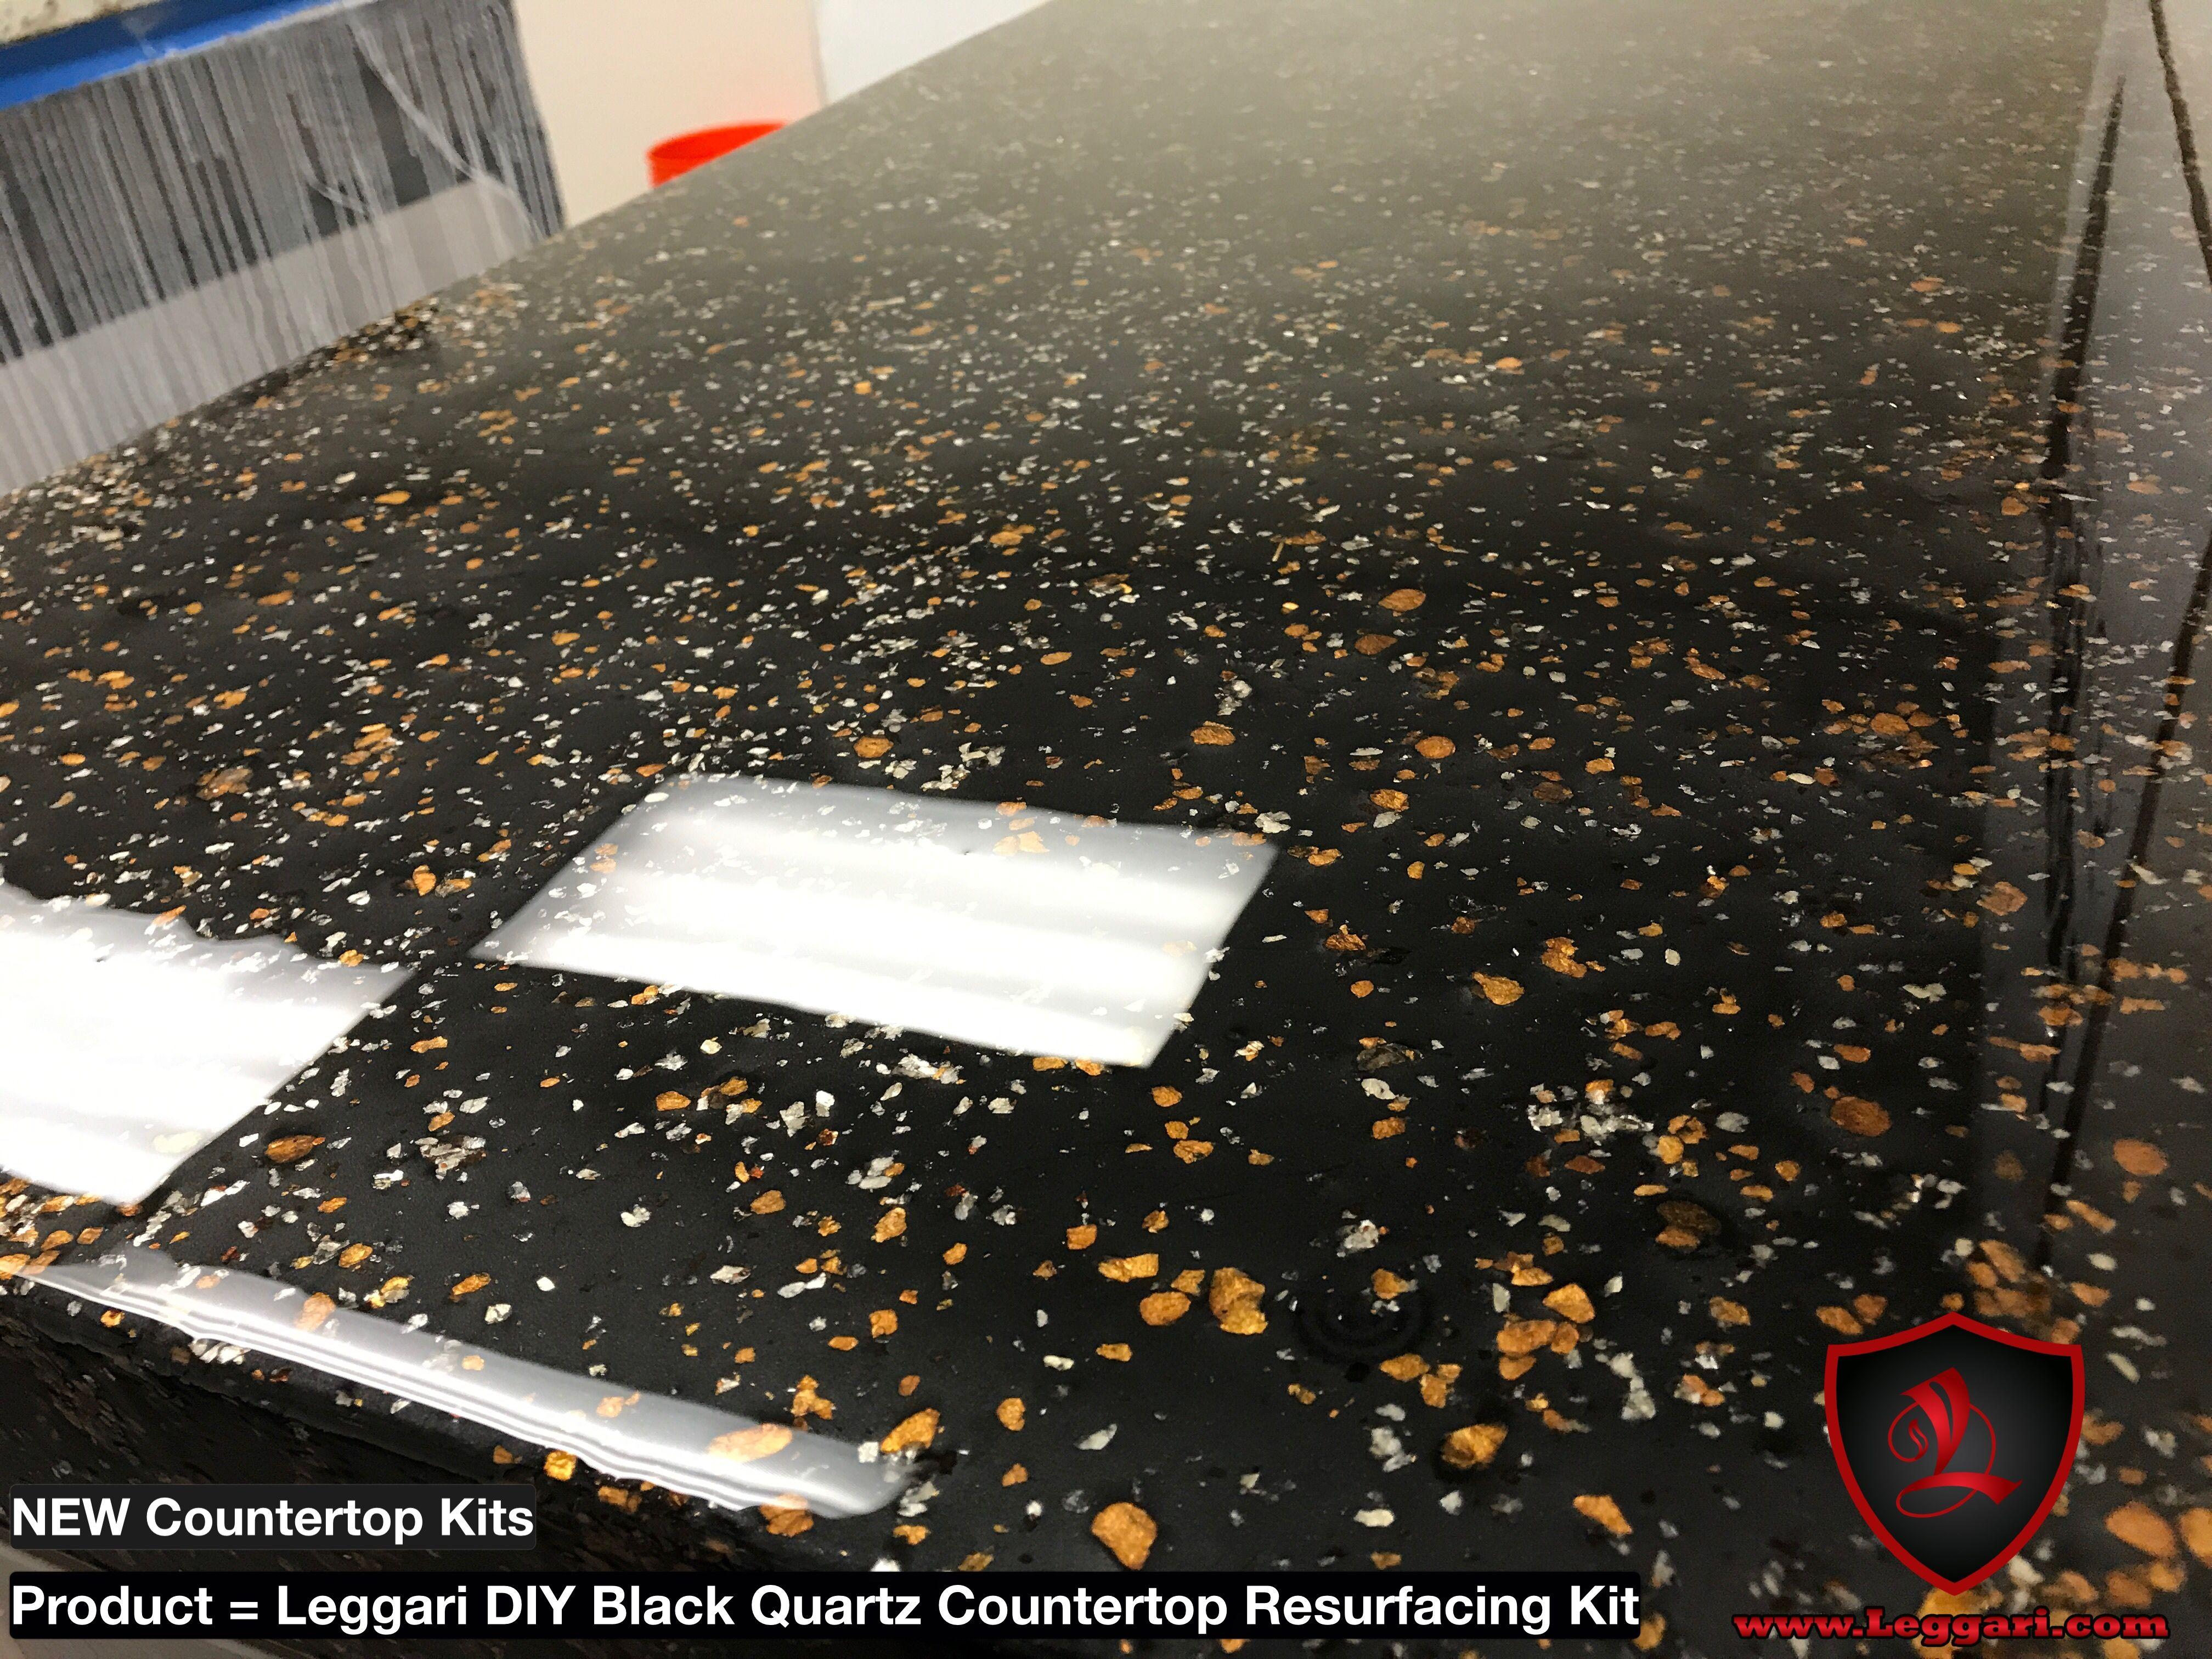 Diy Quartz Countertop Resurfacing Kits If You Can Sprinkle